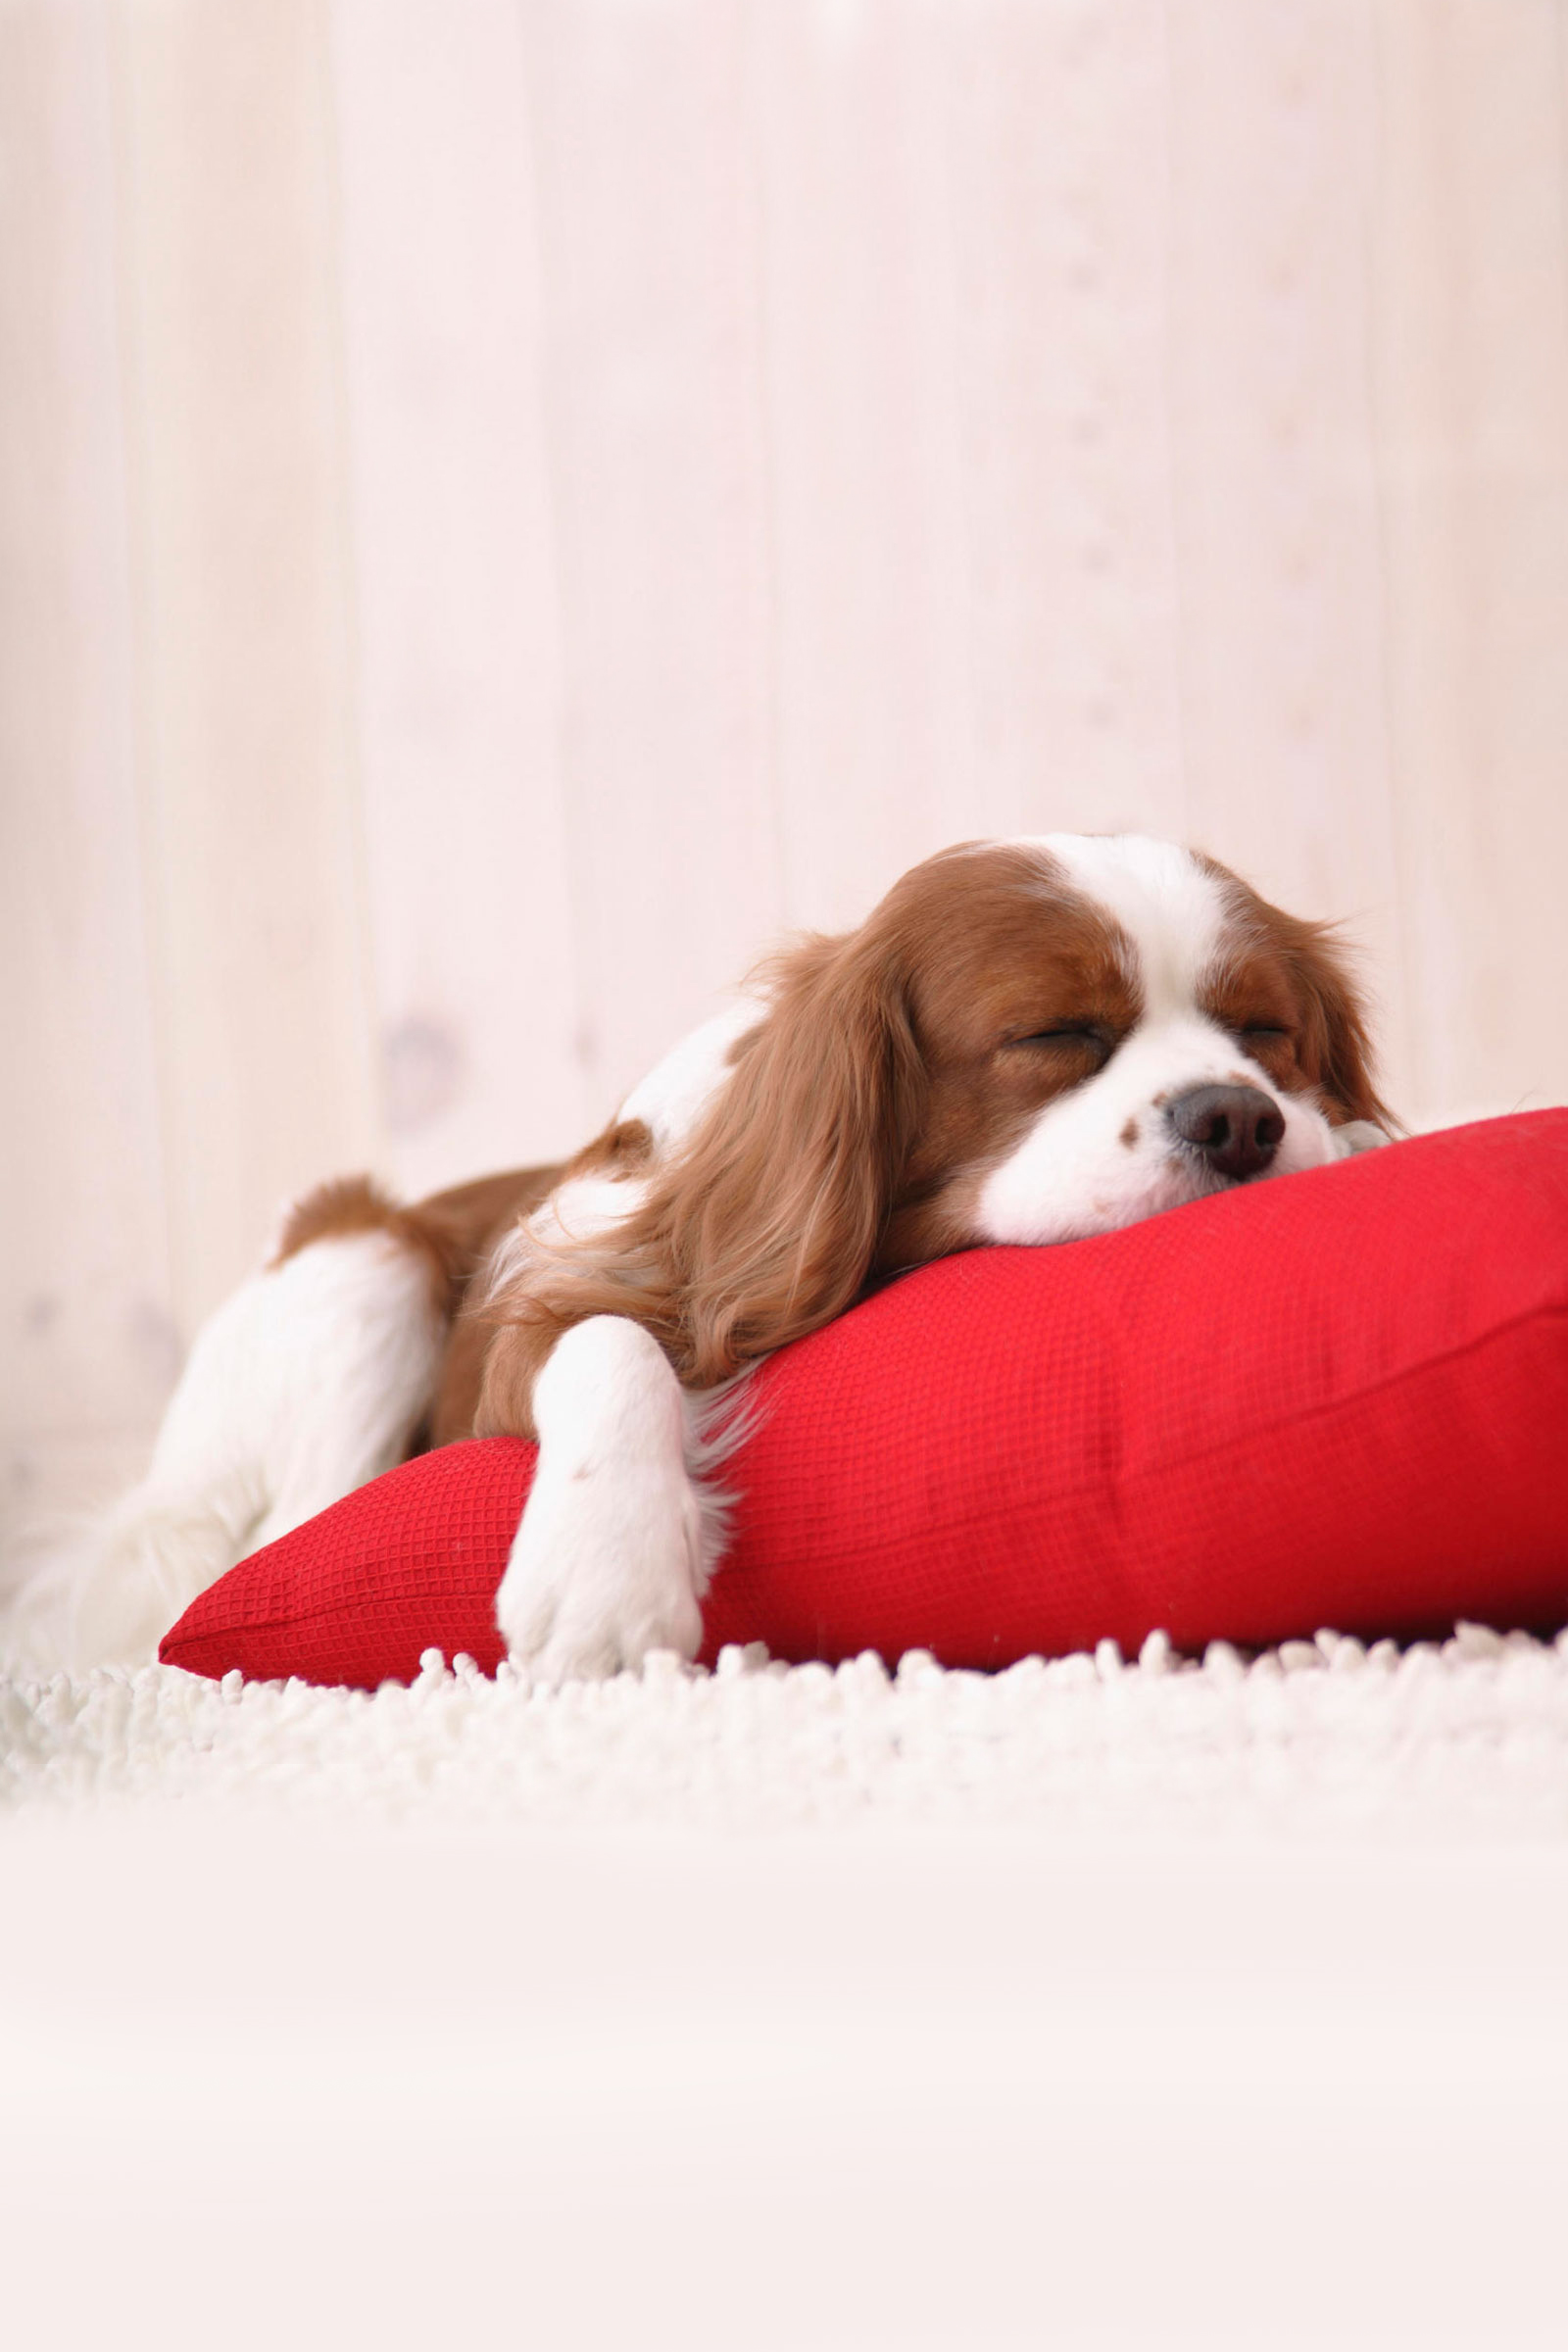 Cute Dog Sleeping Android Wallpaper